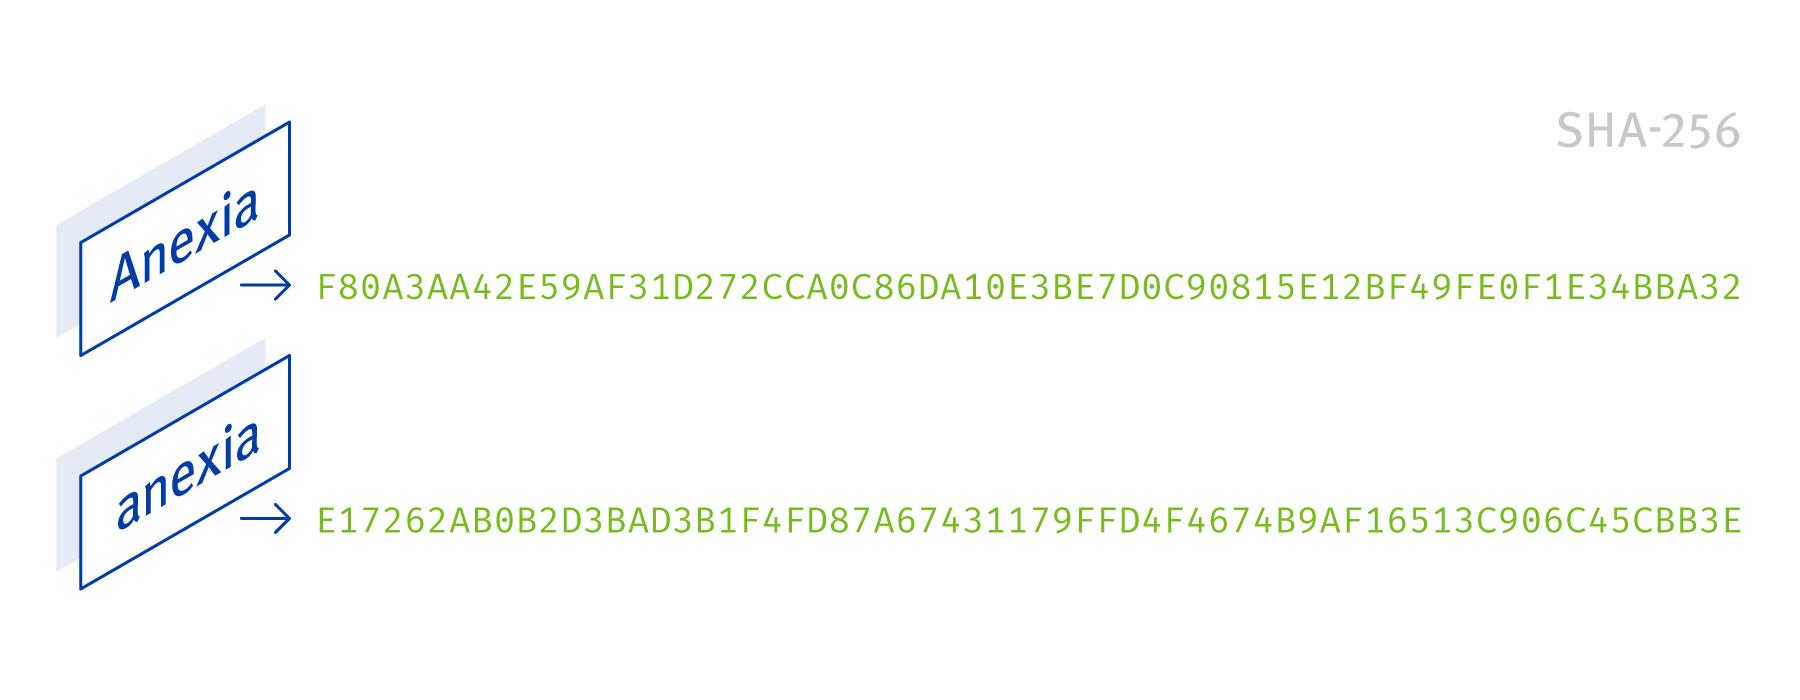 Blockchain Hash Funktion